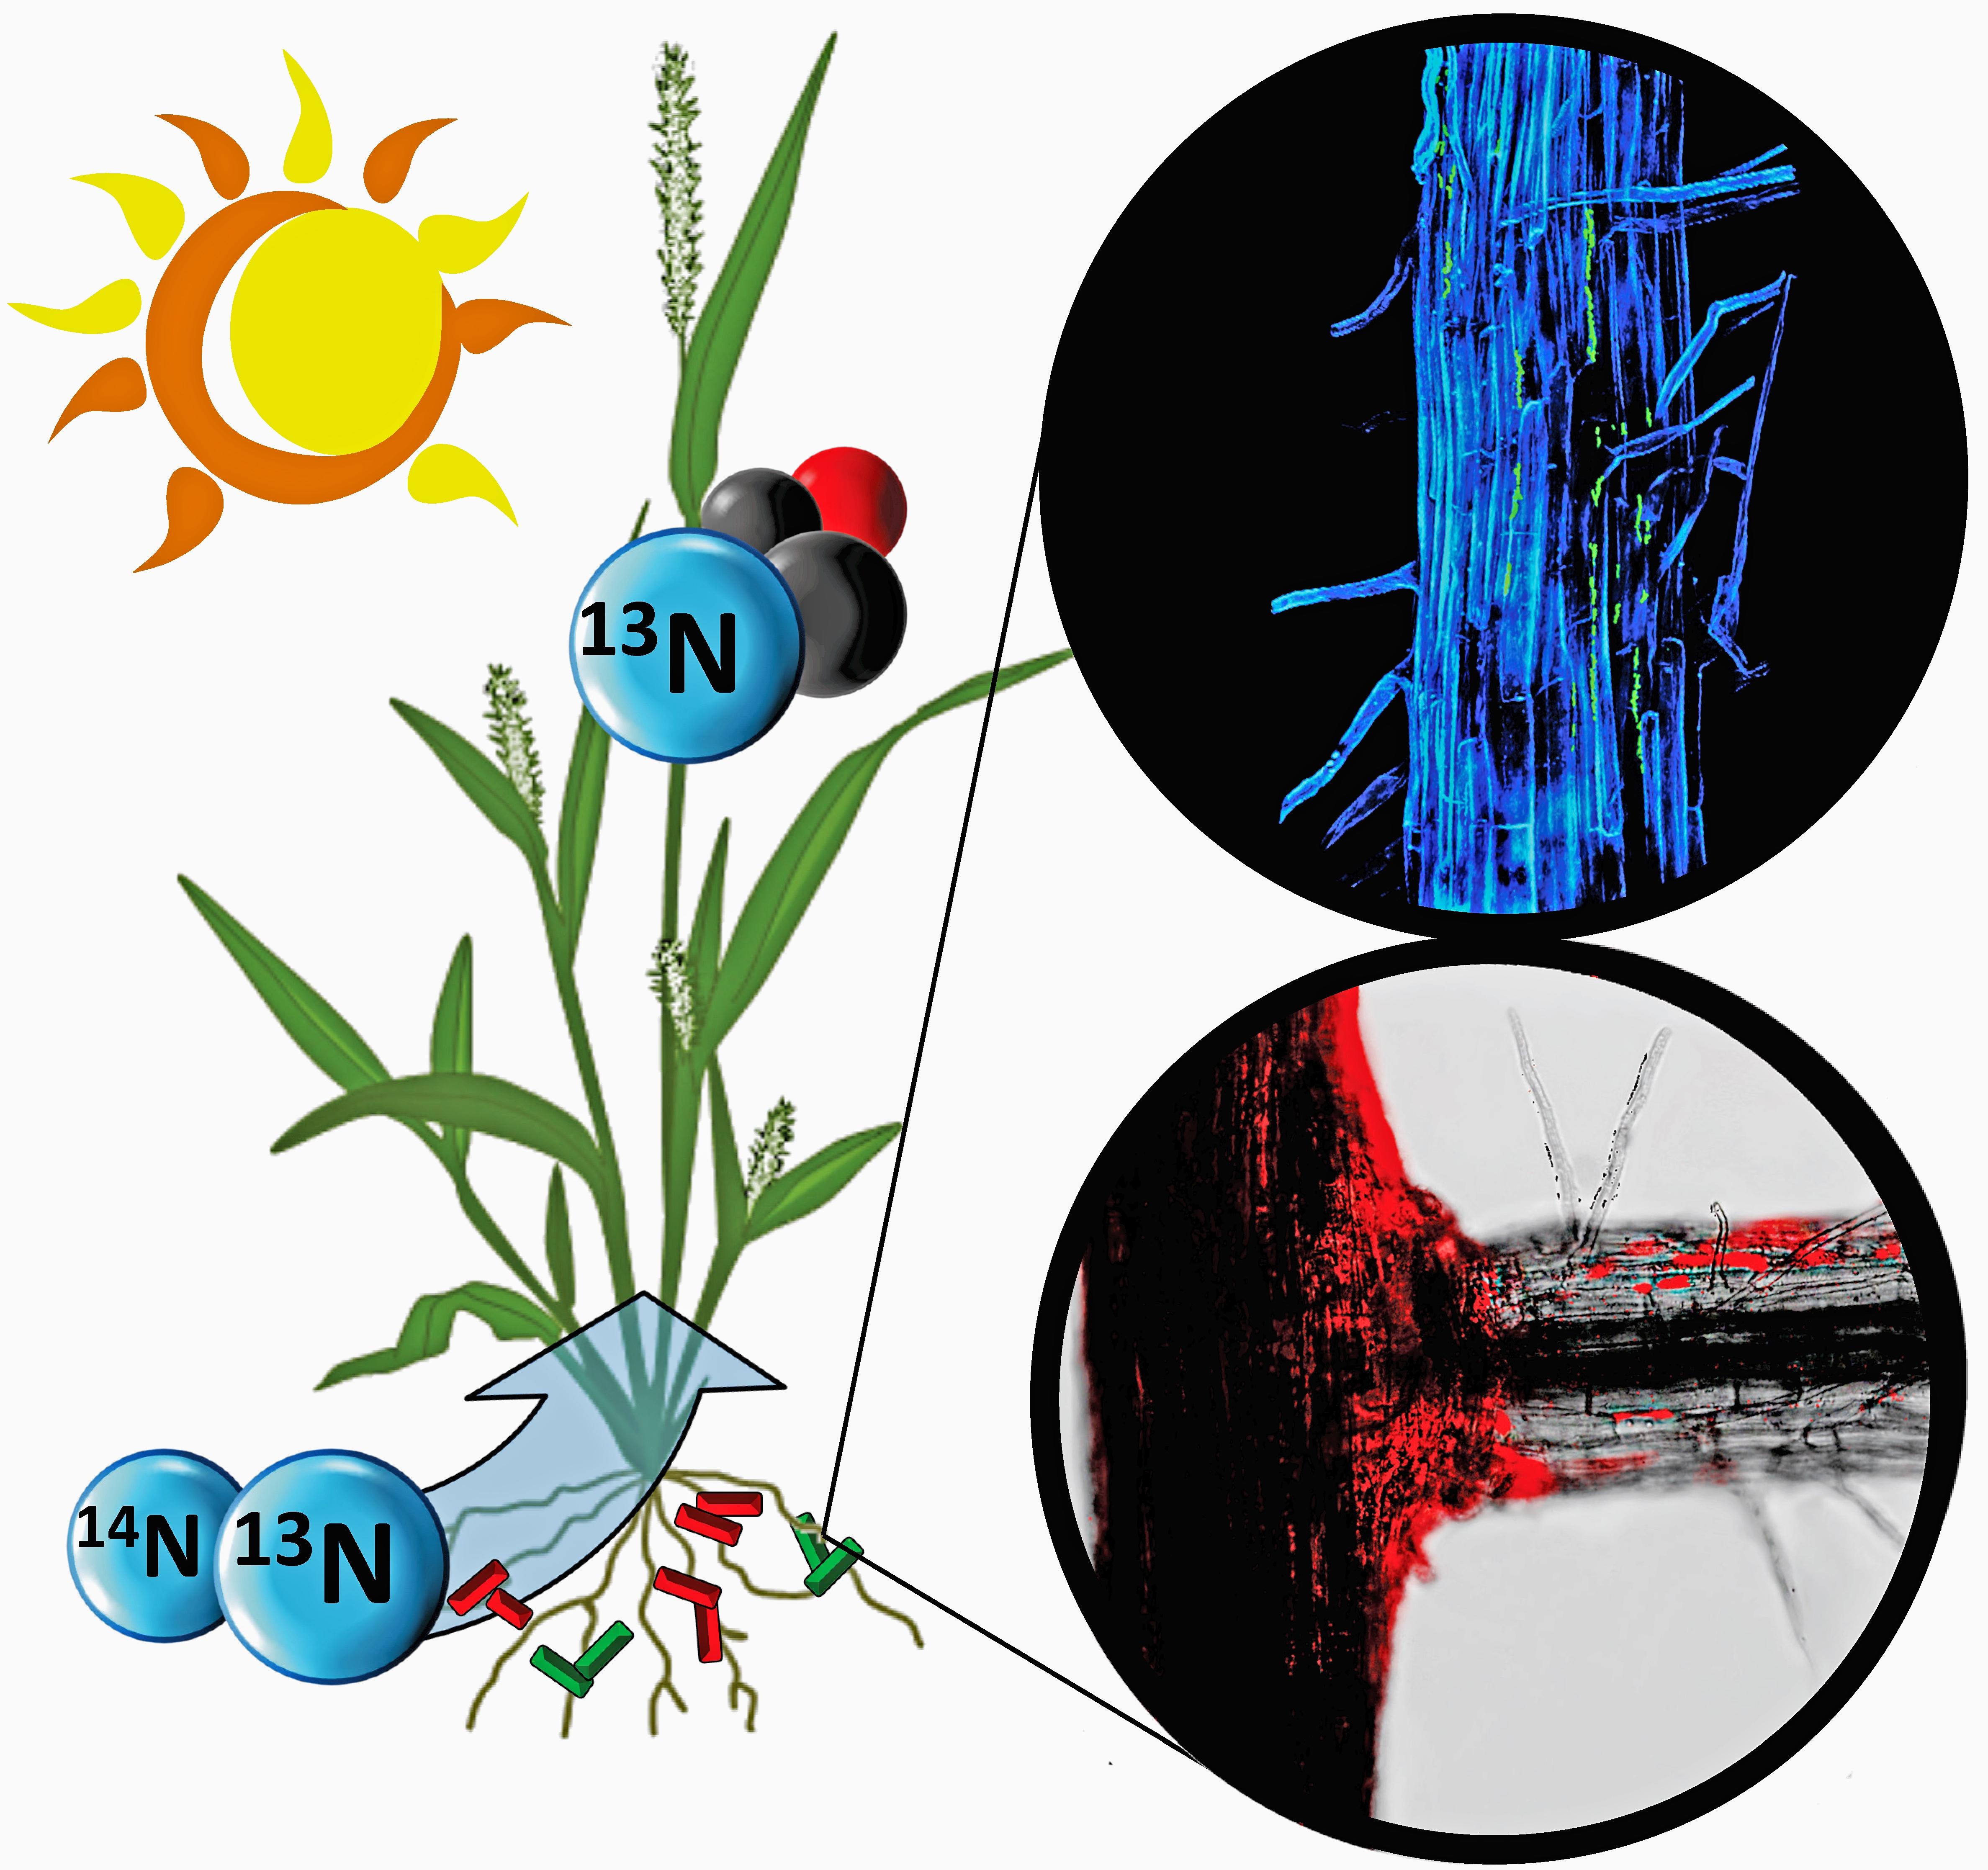 bacteria tracked feeding nitrogen to nutrient-starved plants | bnl